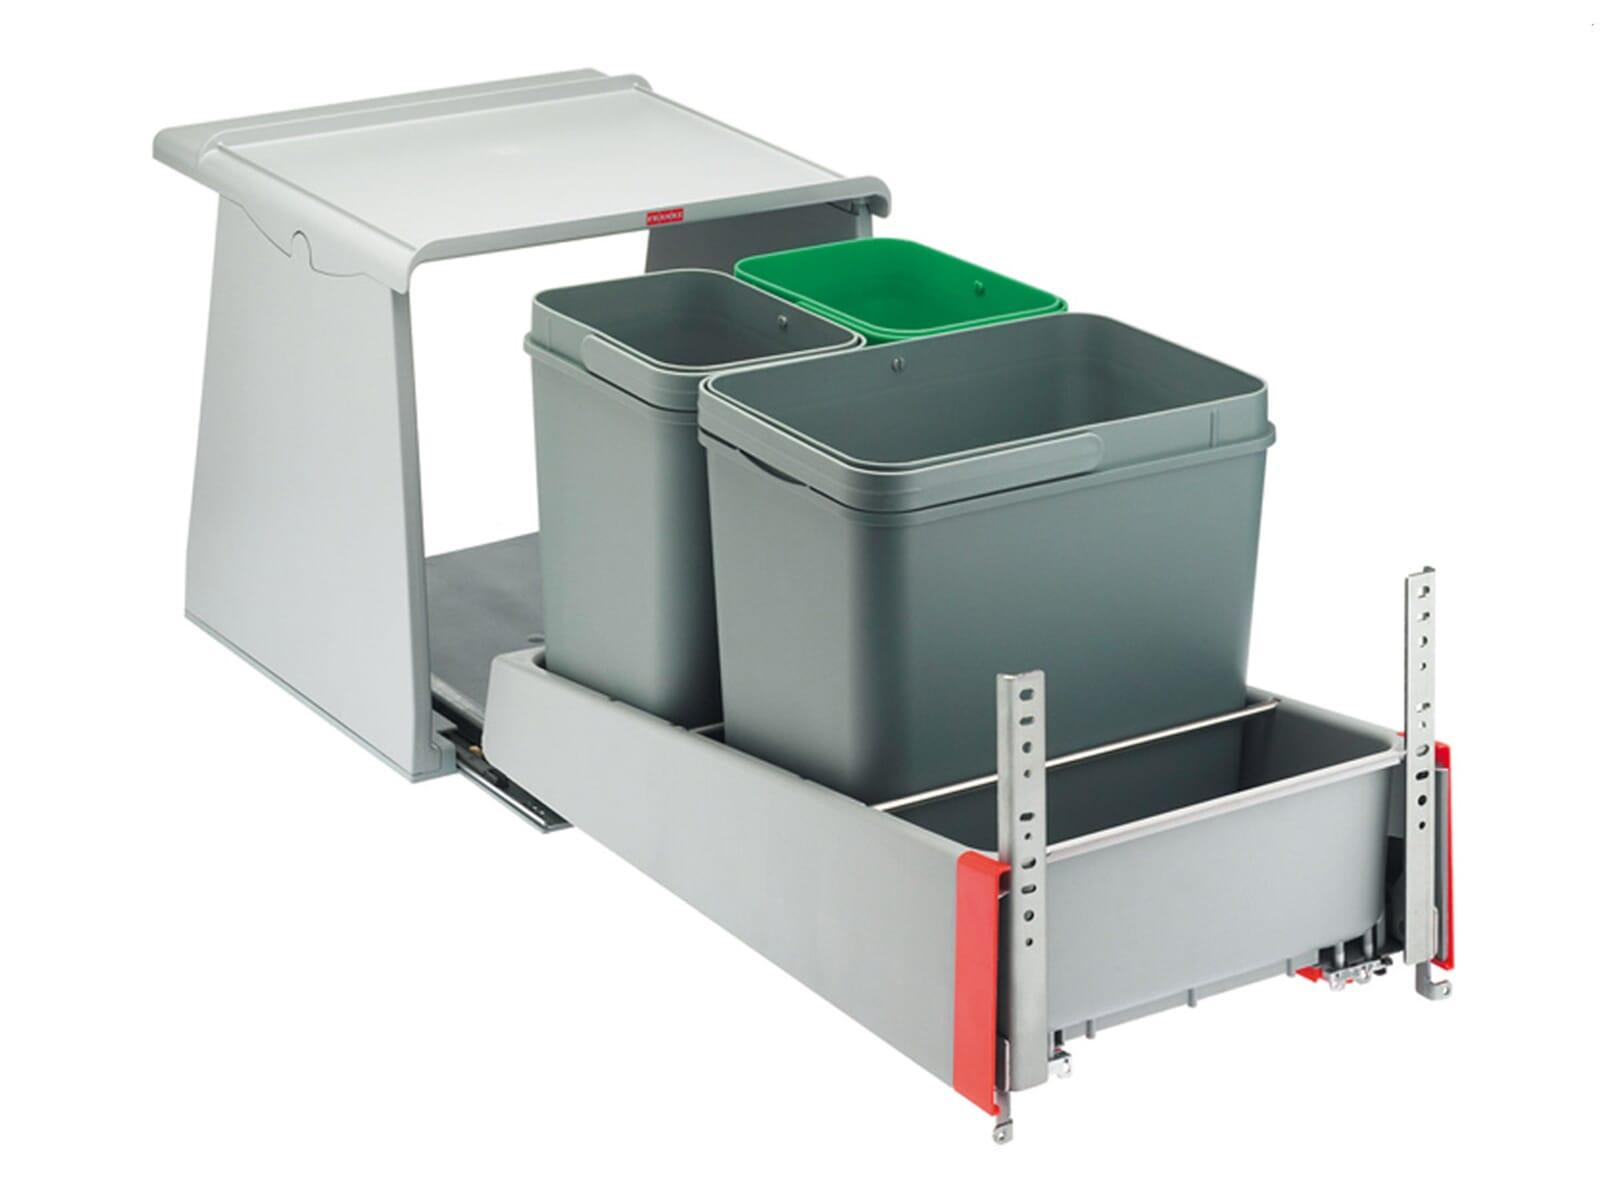 Produktabbildung Franke Sorter 700 Eck KickMatic - 121.0014.912 Einbau Abfallsammler